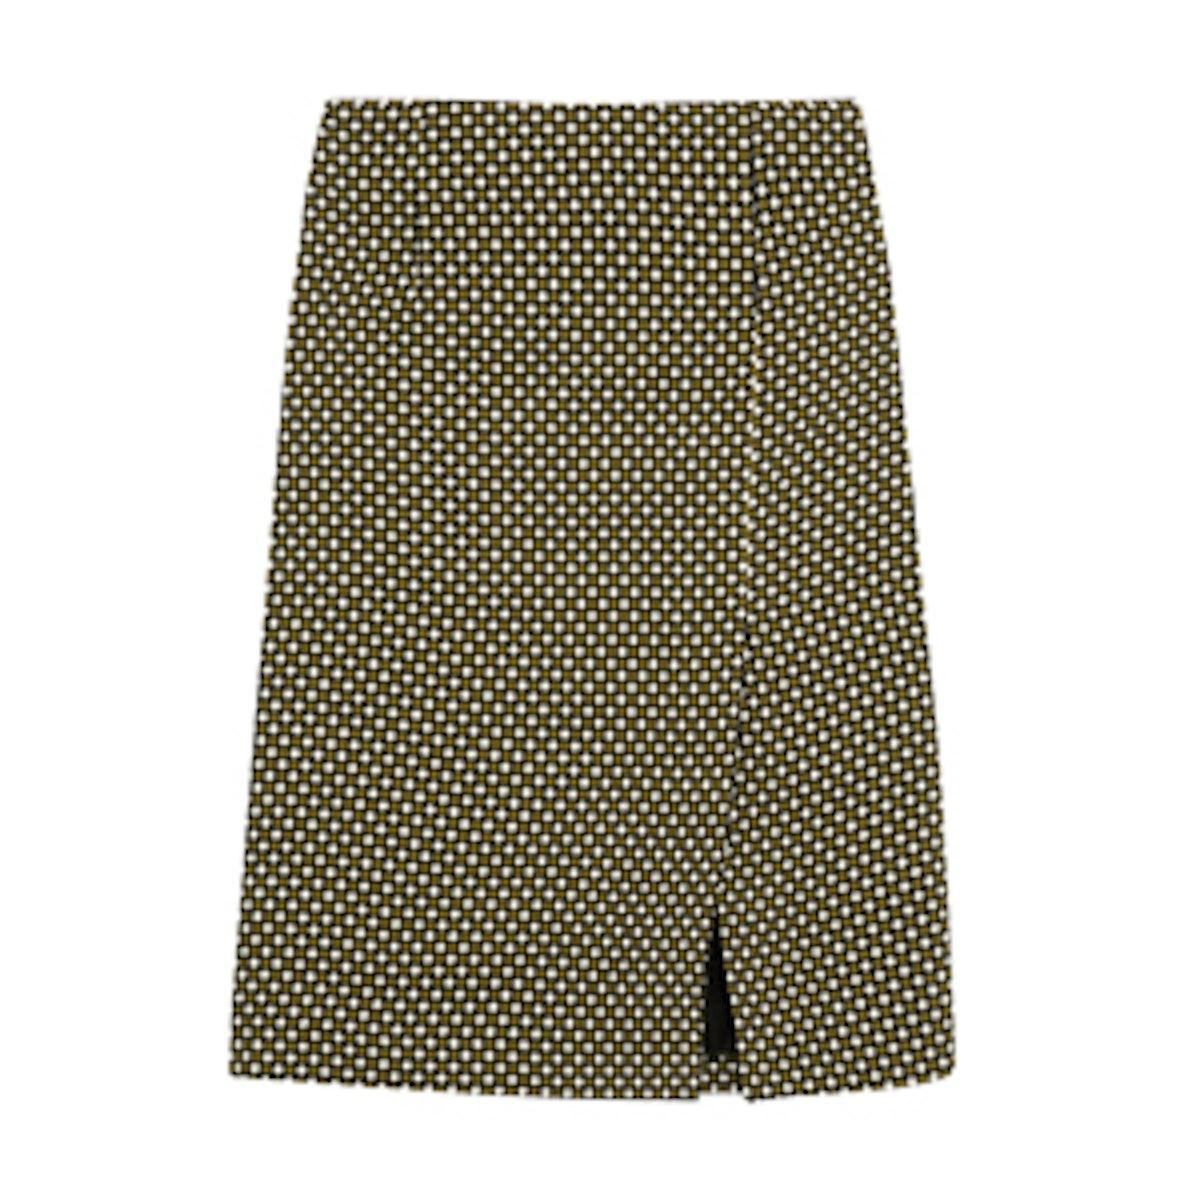 Printed Silk and Wool Pencil Skirt